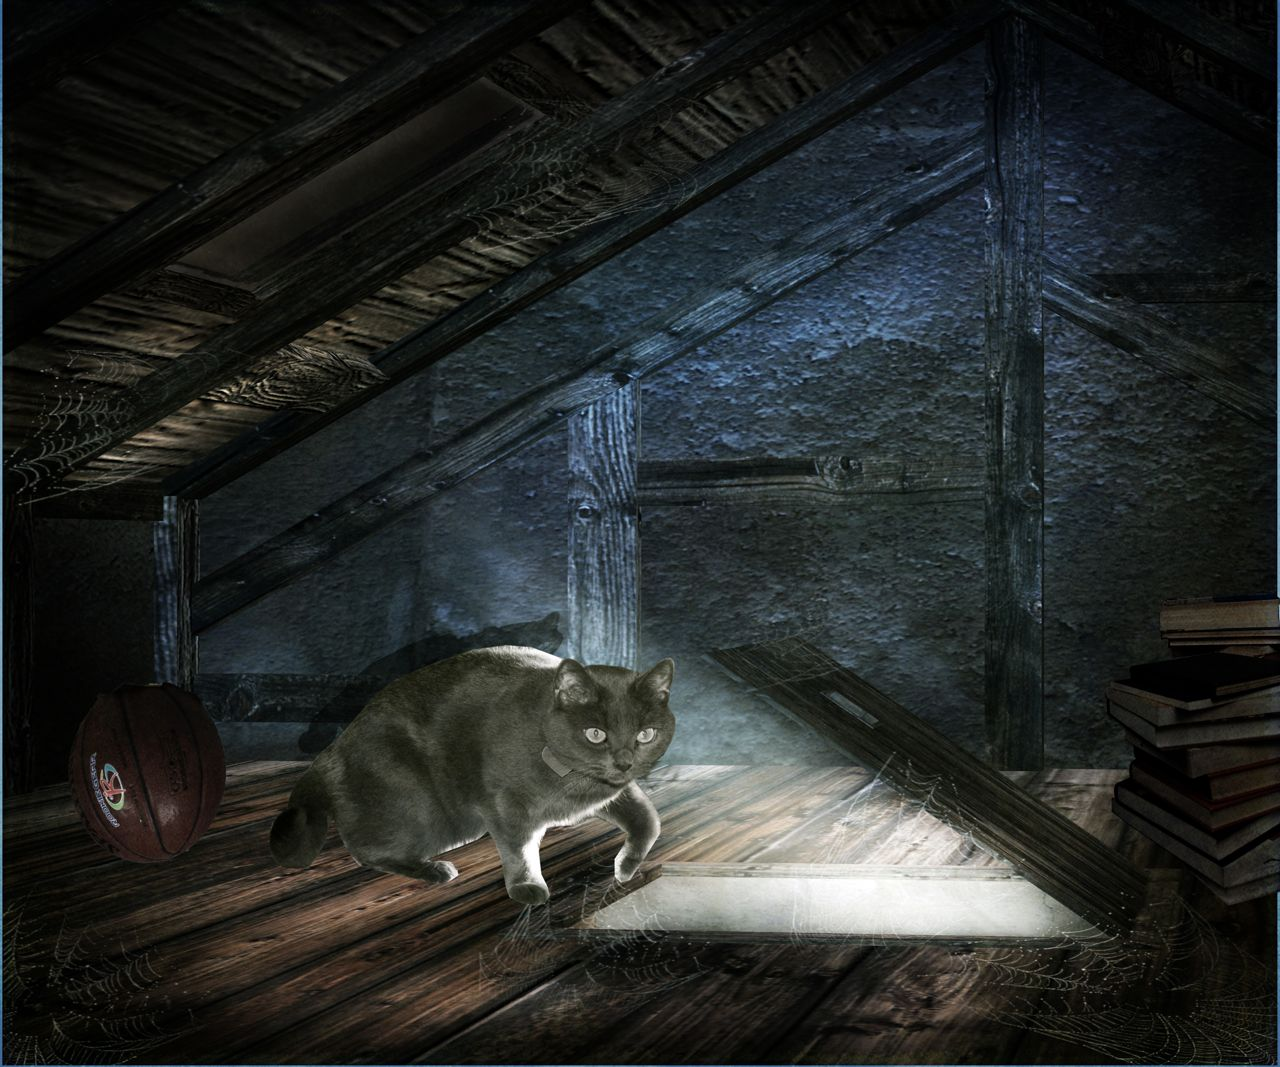 The Cat in the Attic